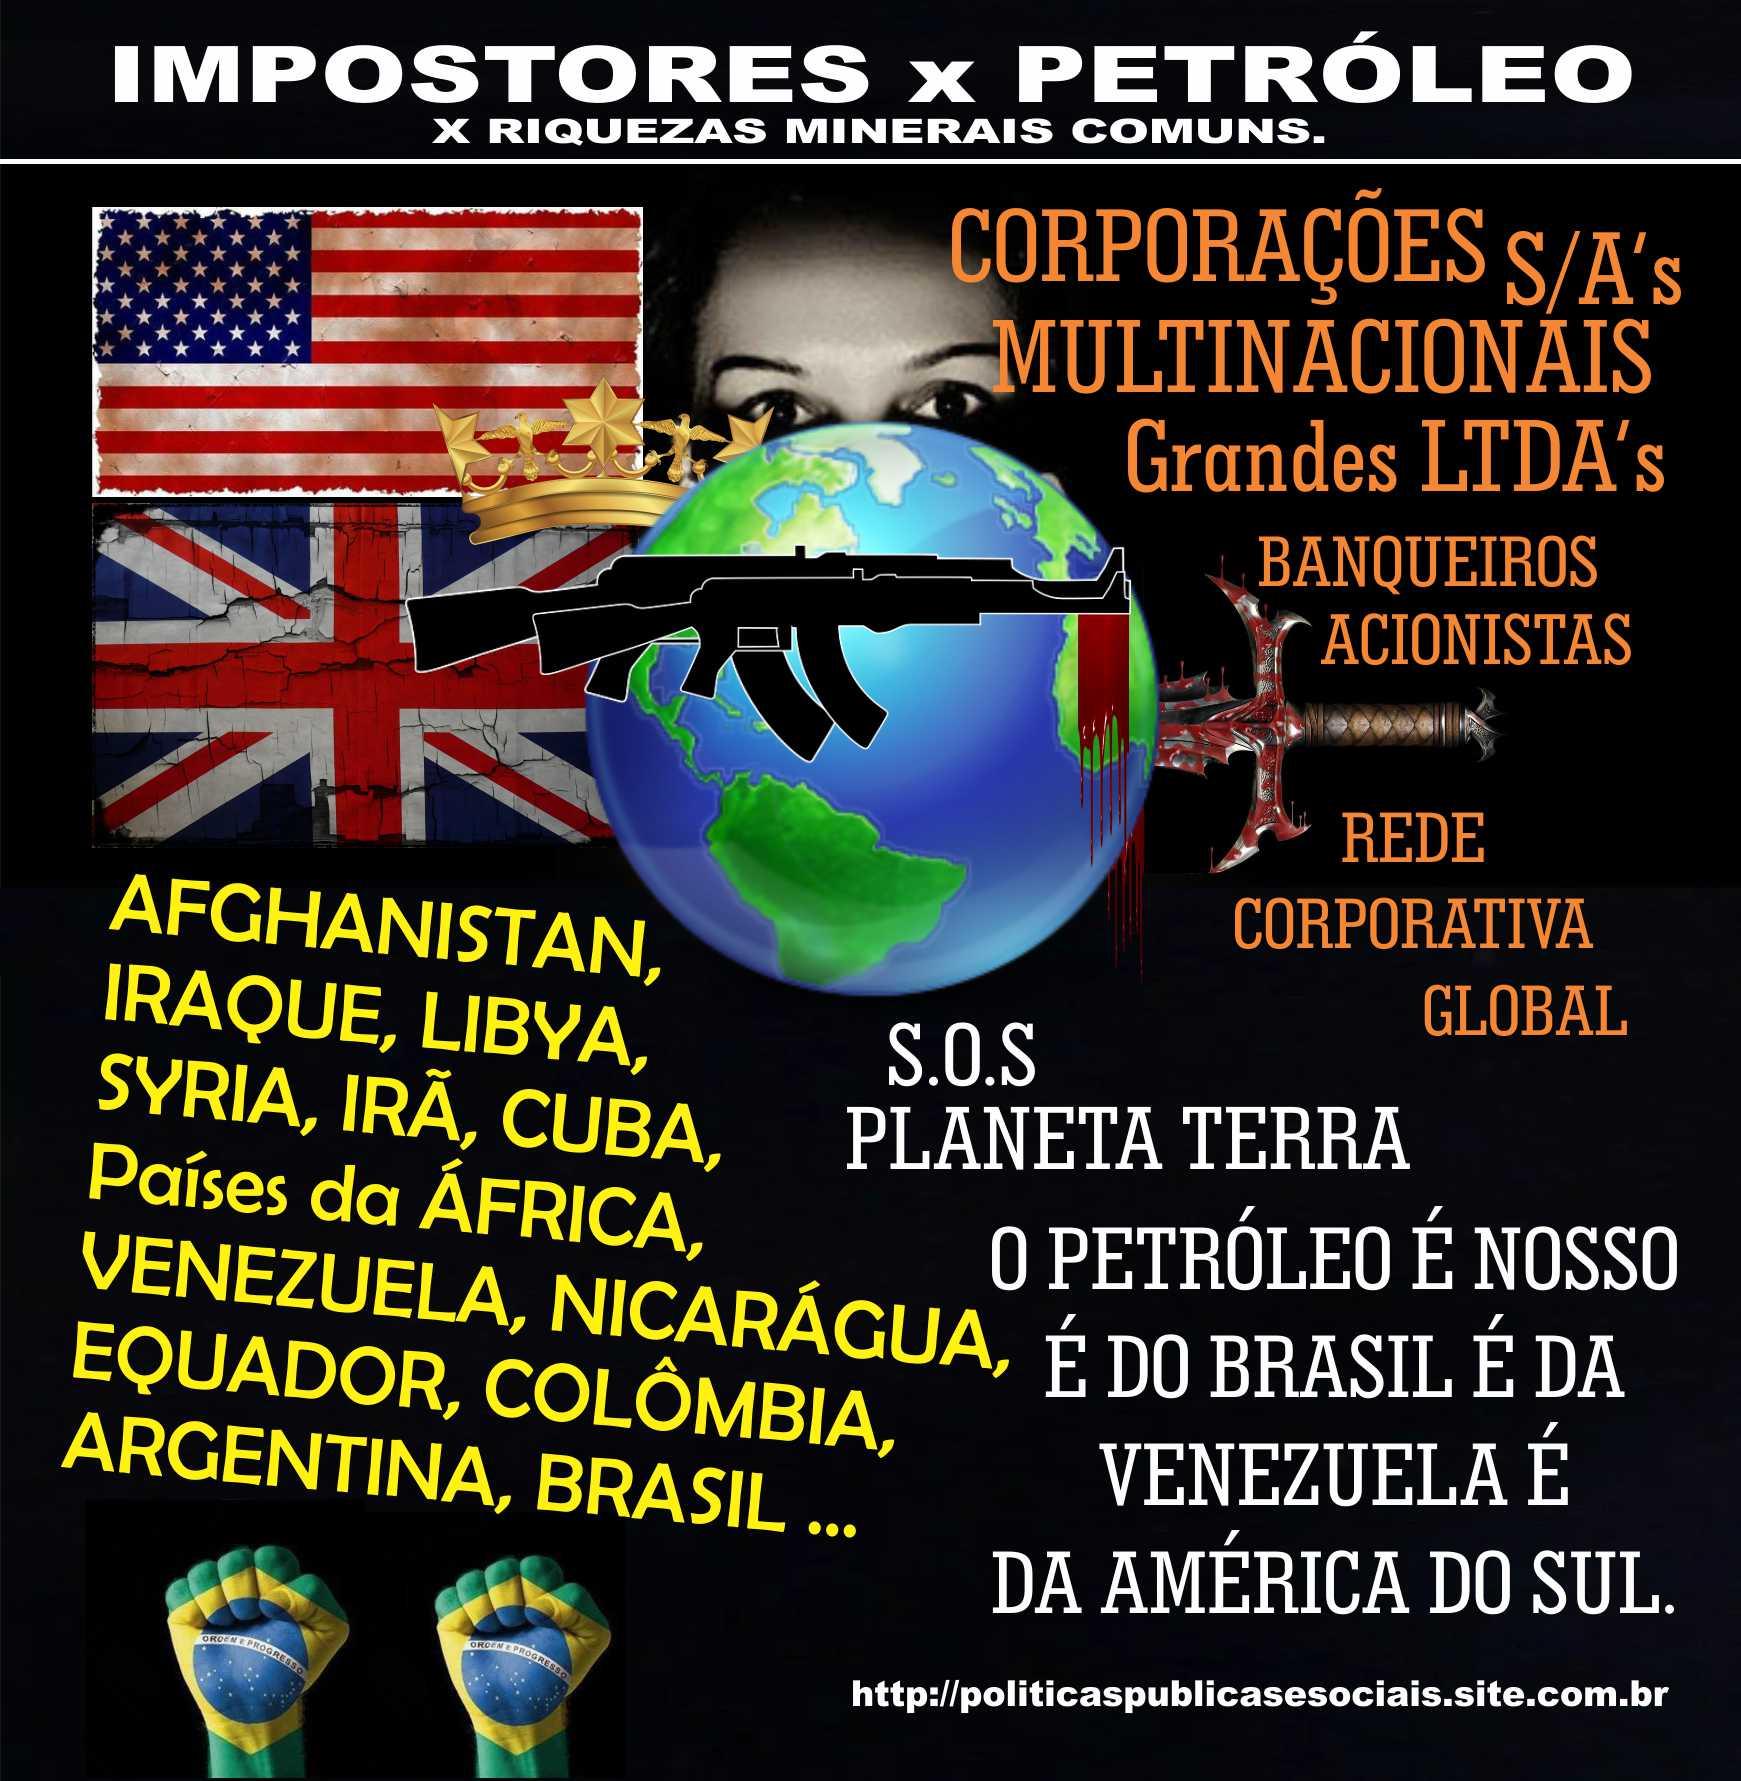 IMPOSTORES PETRÓLEO RIQUEZAS MINERAIS COMUNS